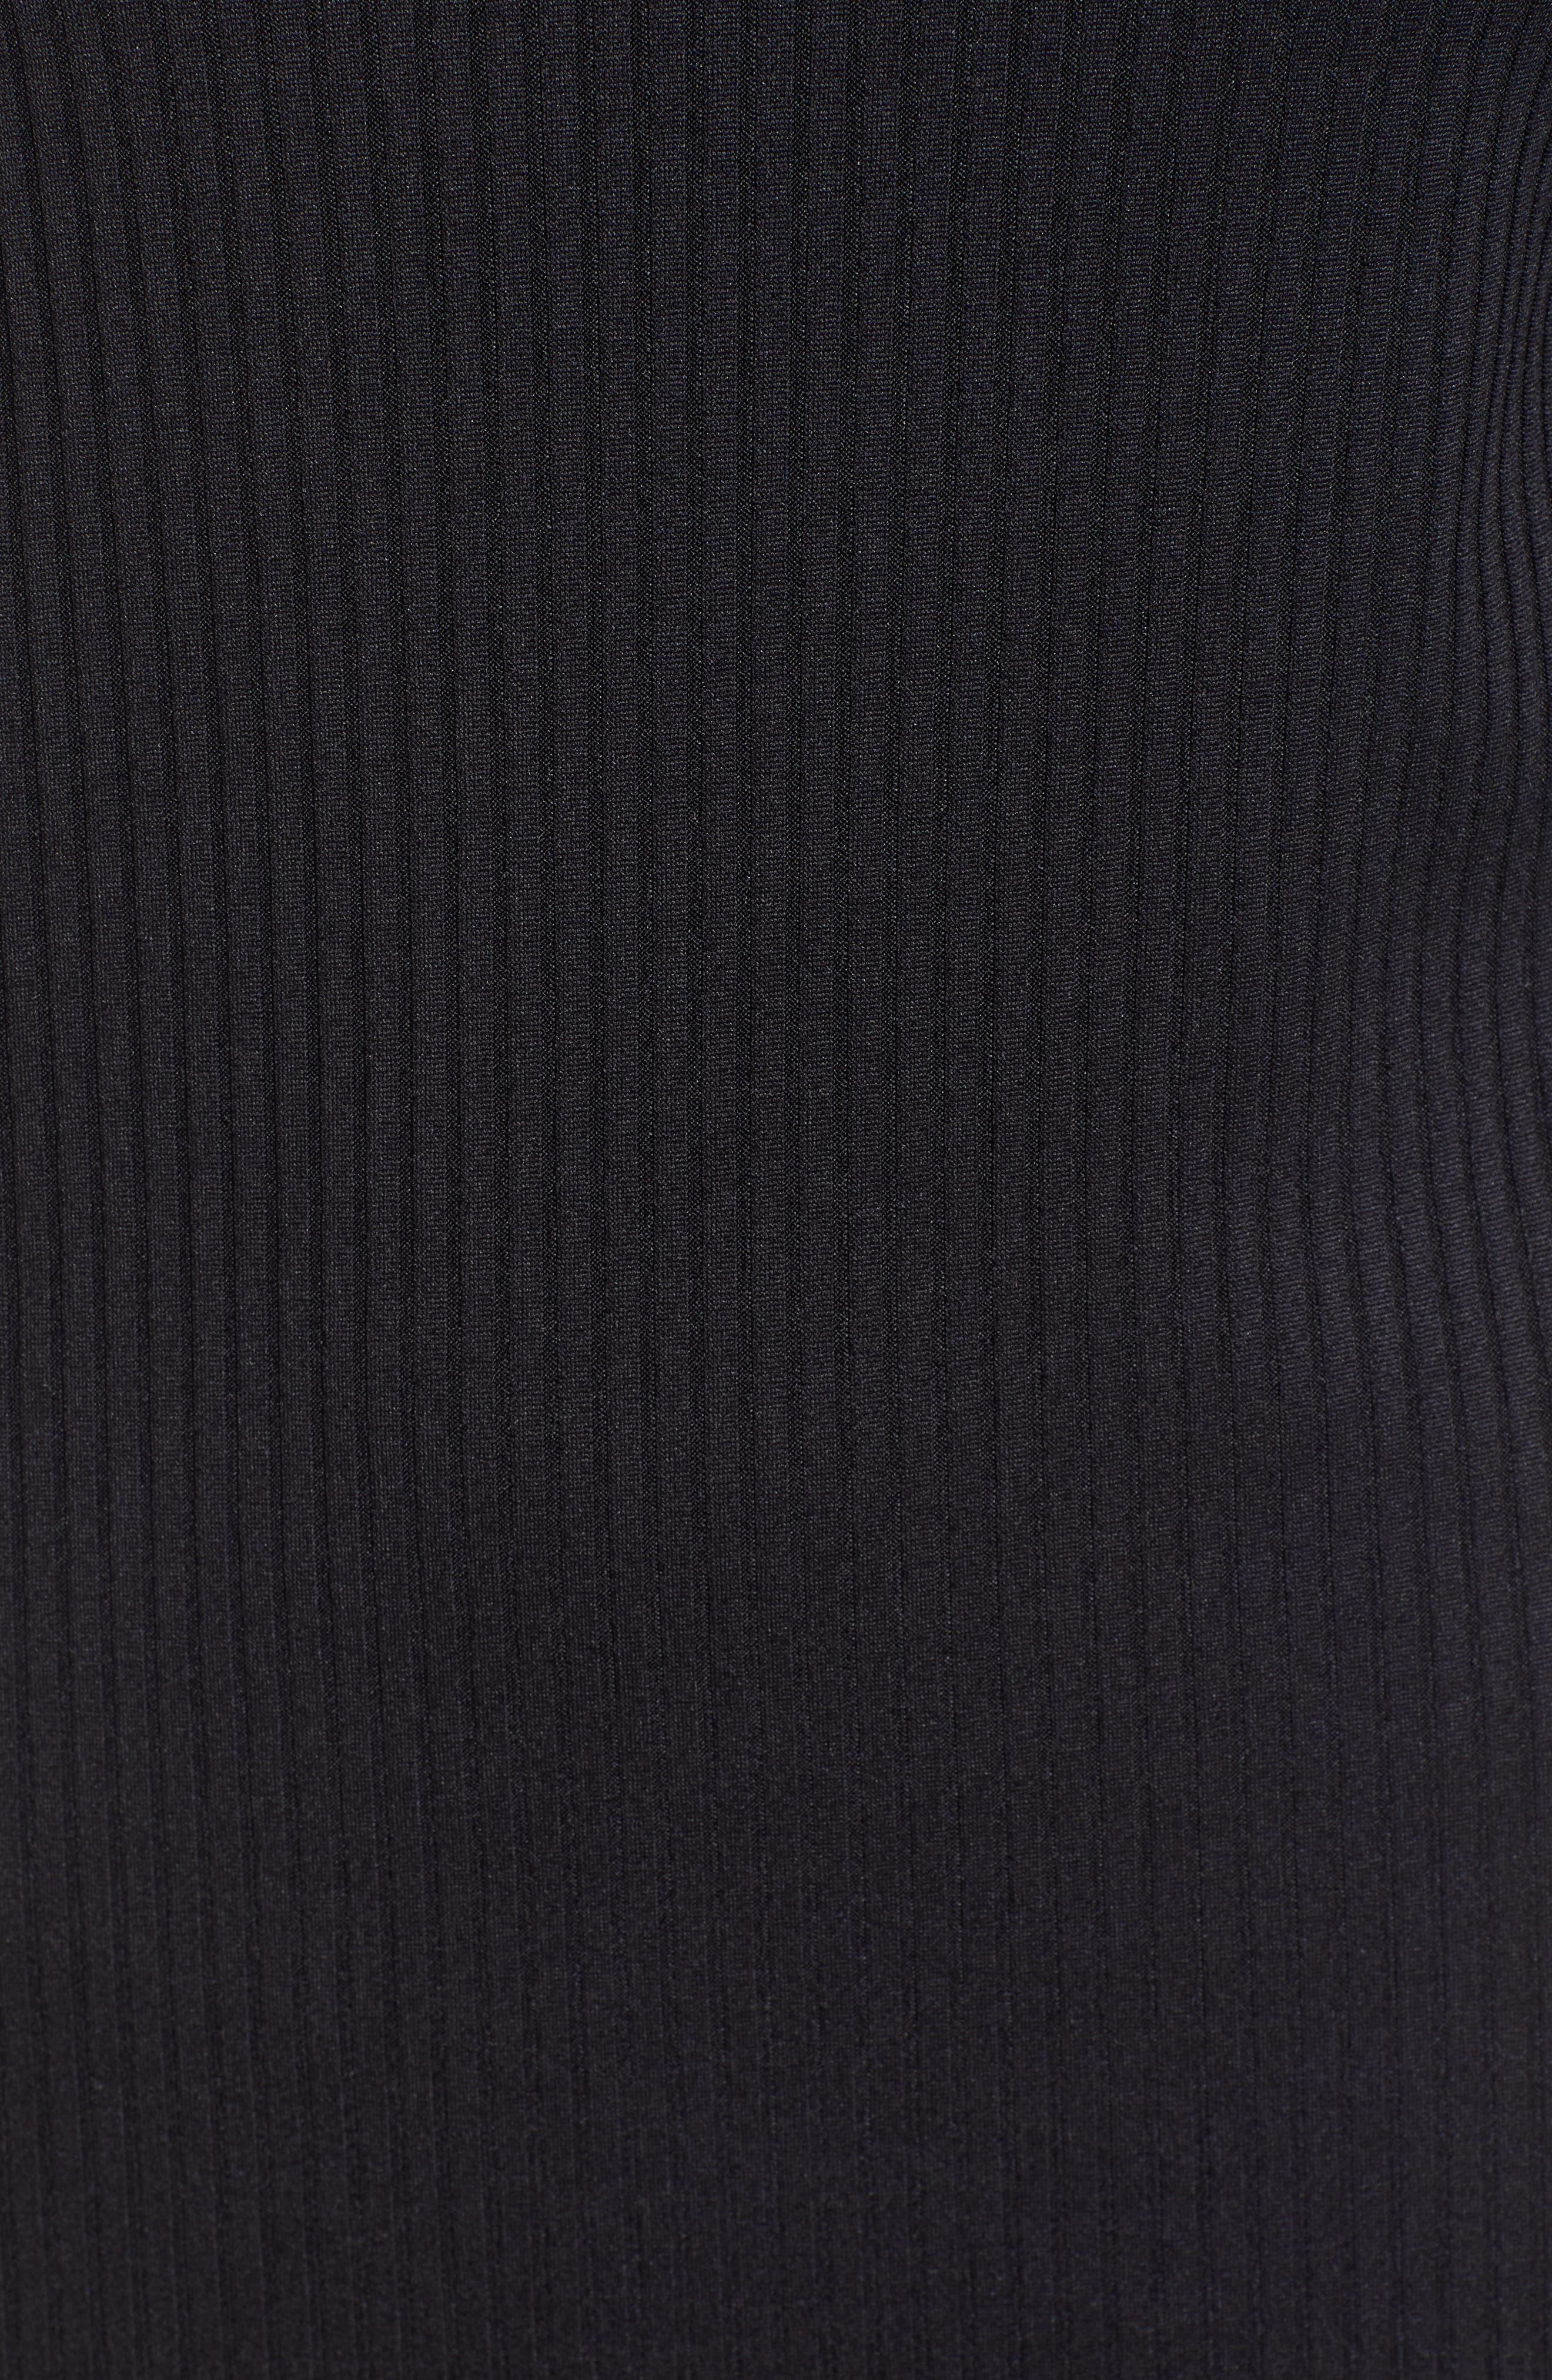 ---, Ribbed Body-Con Minidress, Alternate thumbnail 5, color, 001